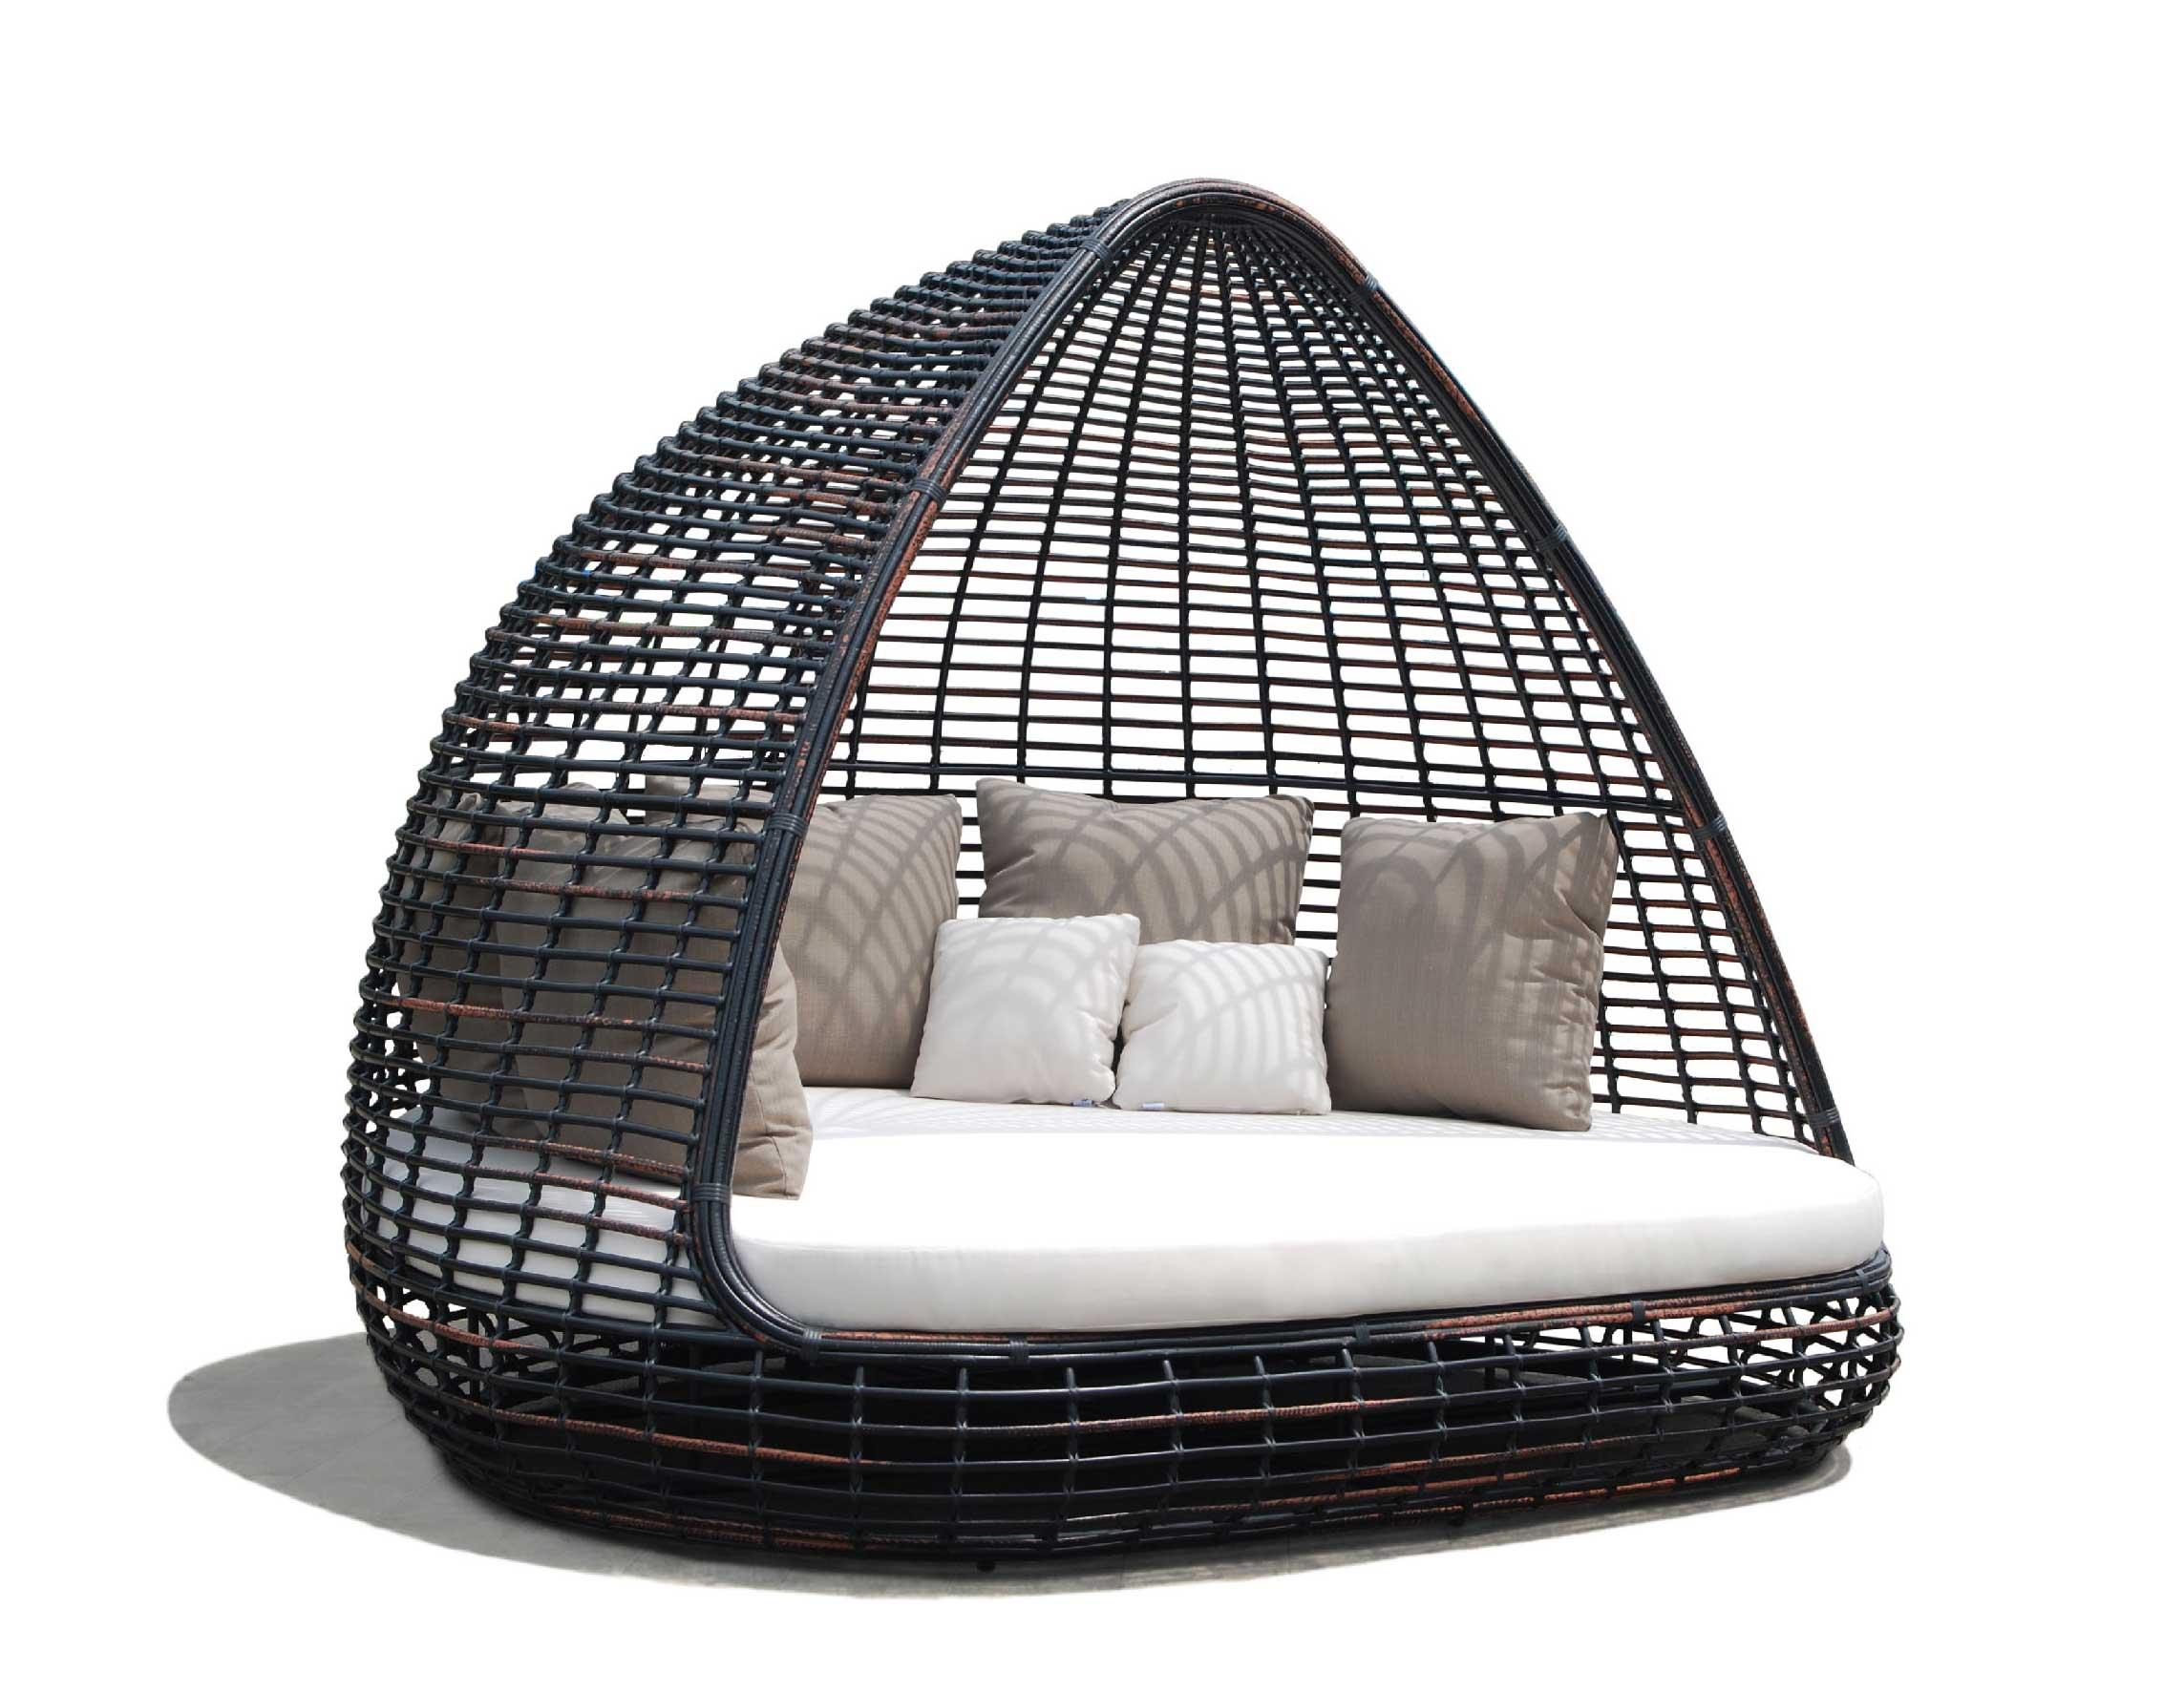 Lit de jardin toit r sine lusso luxe contemporain - Salon de jardin cocoon ...